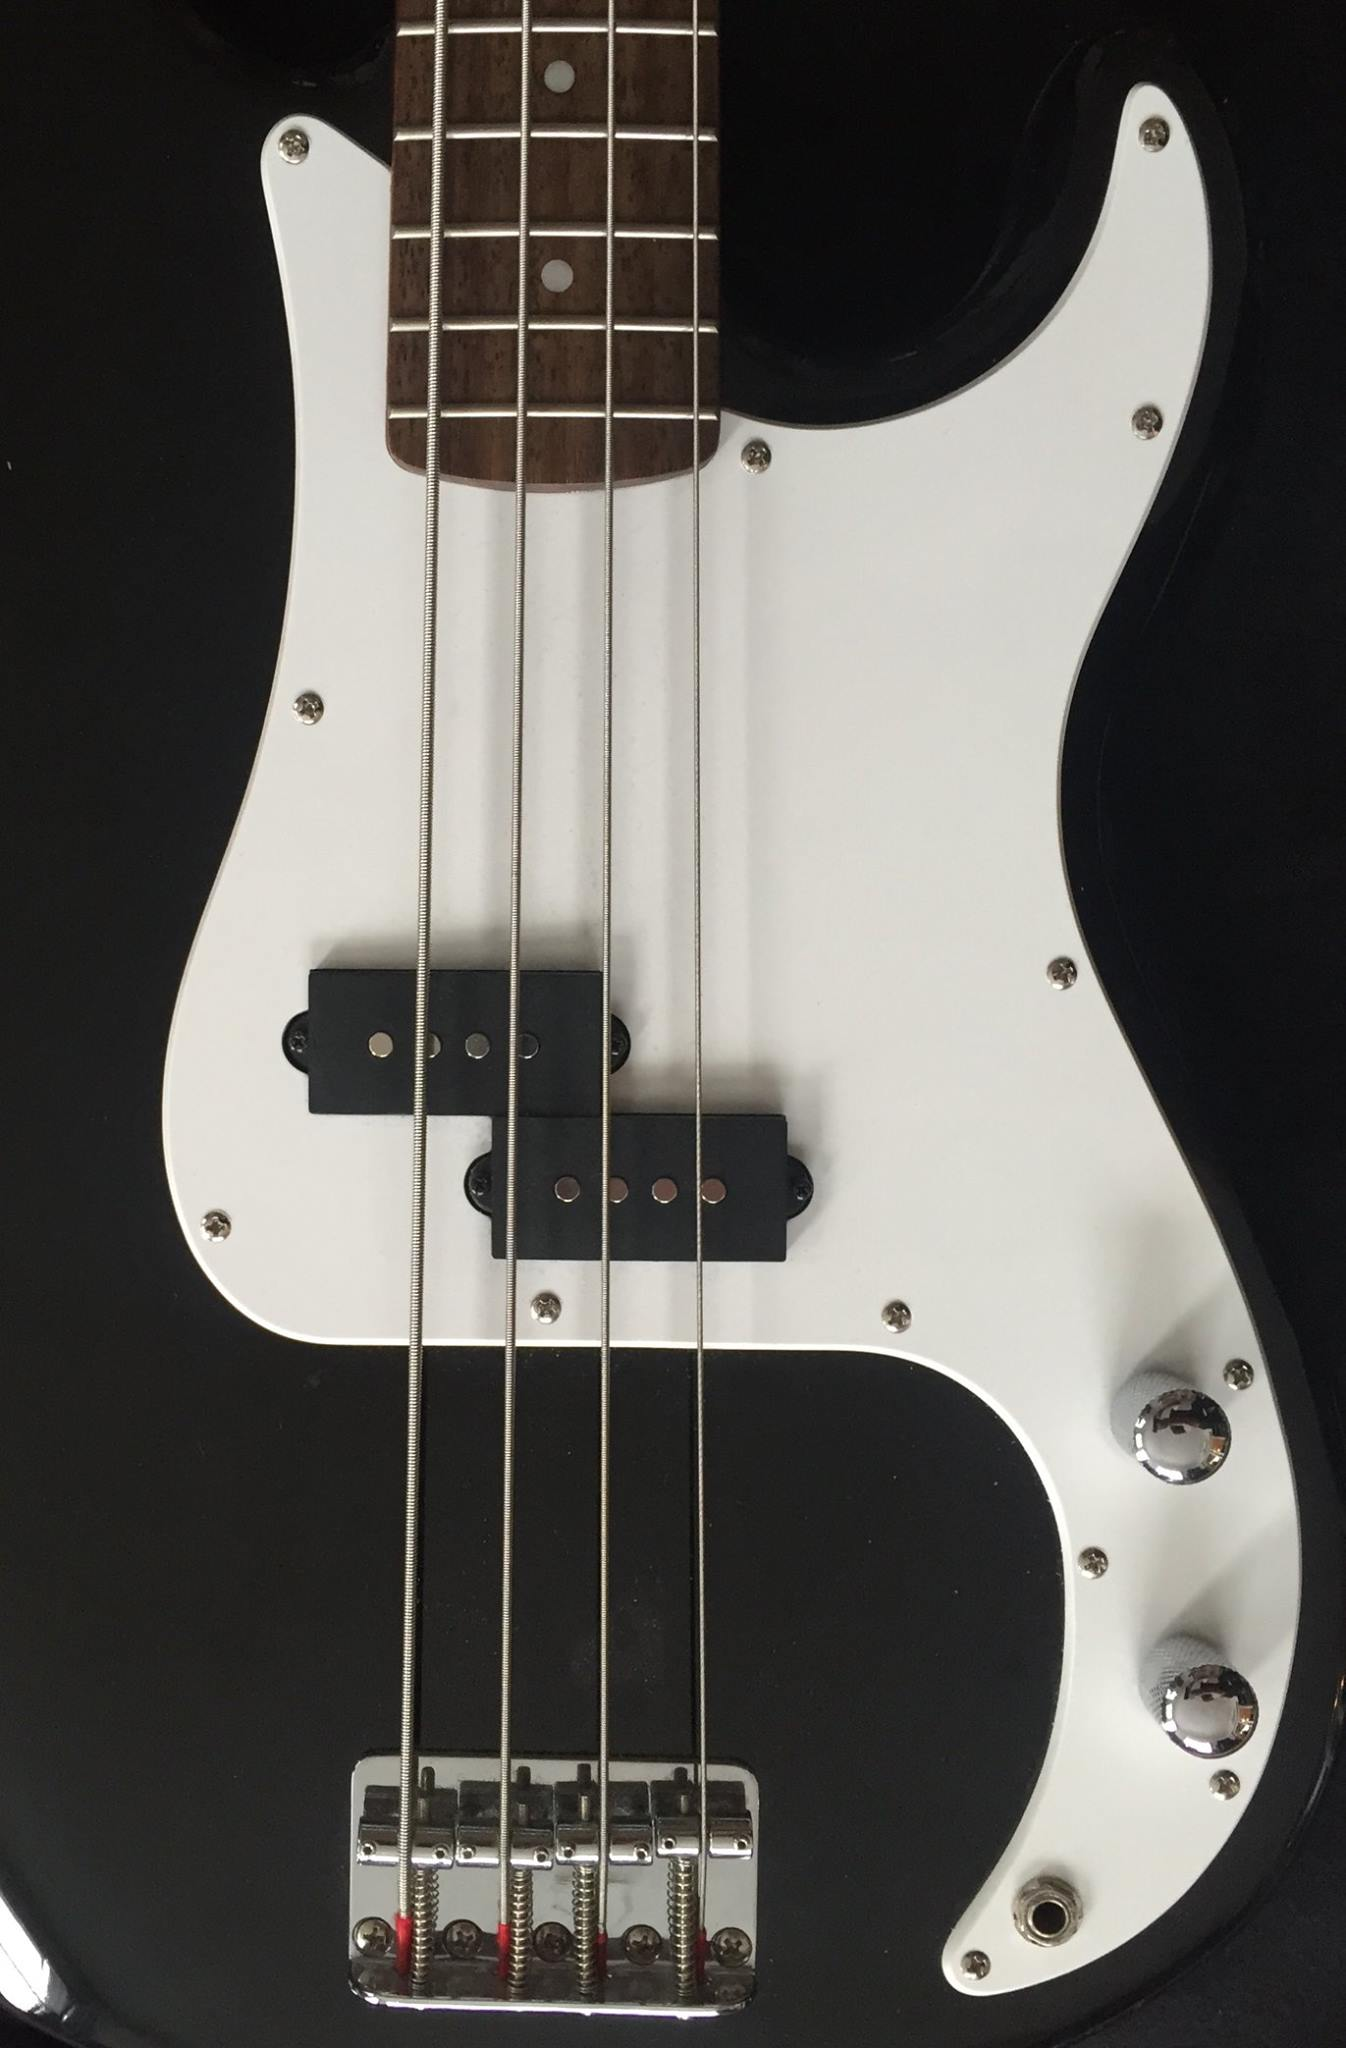 Fender Squire Affinity Precision